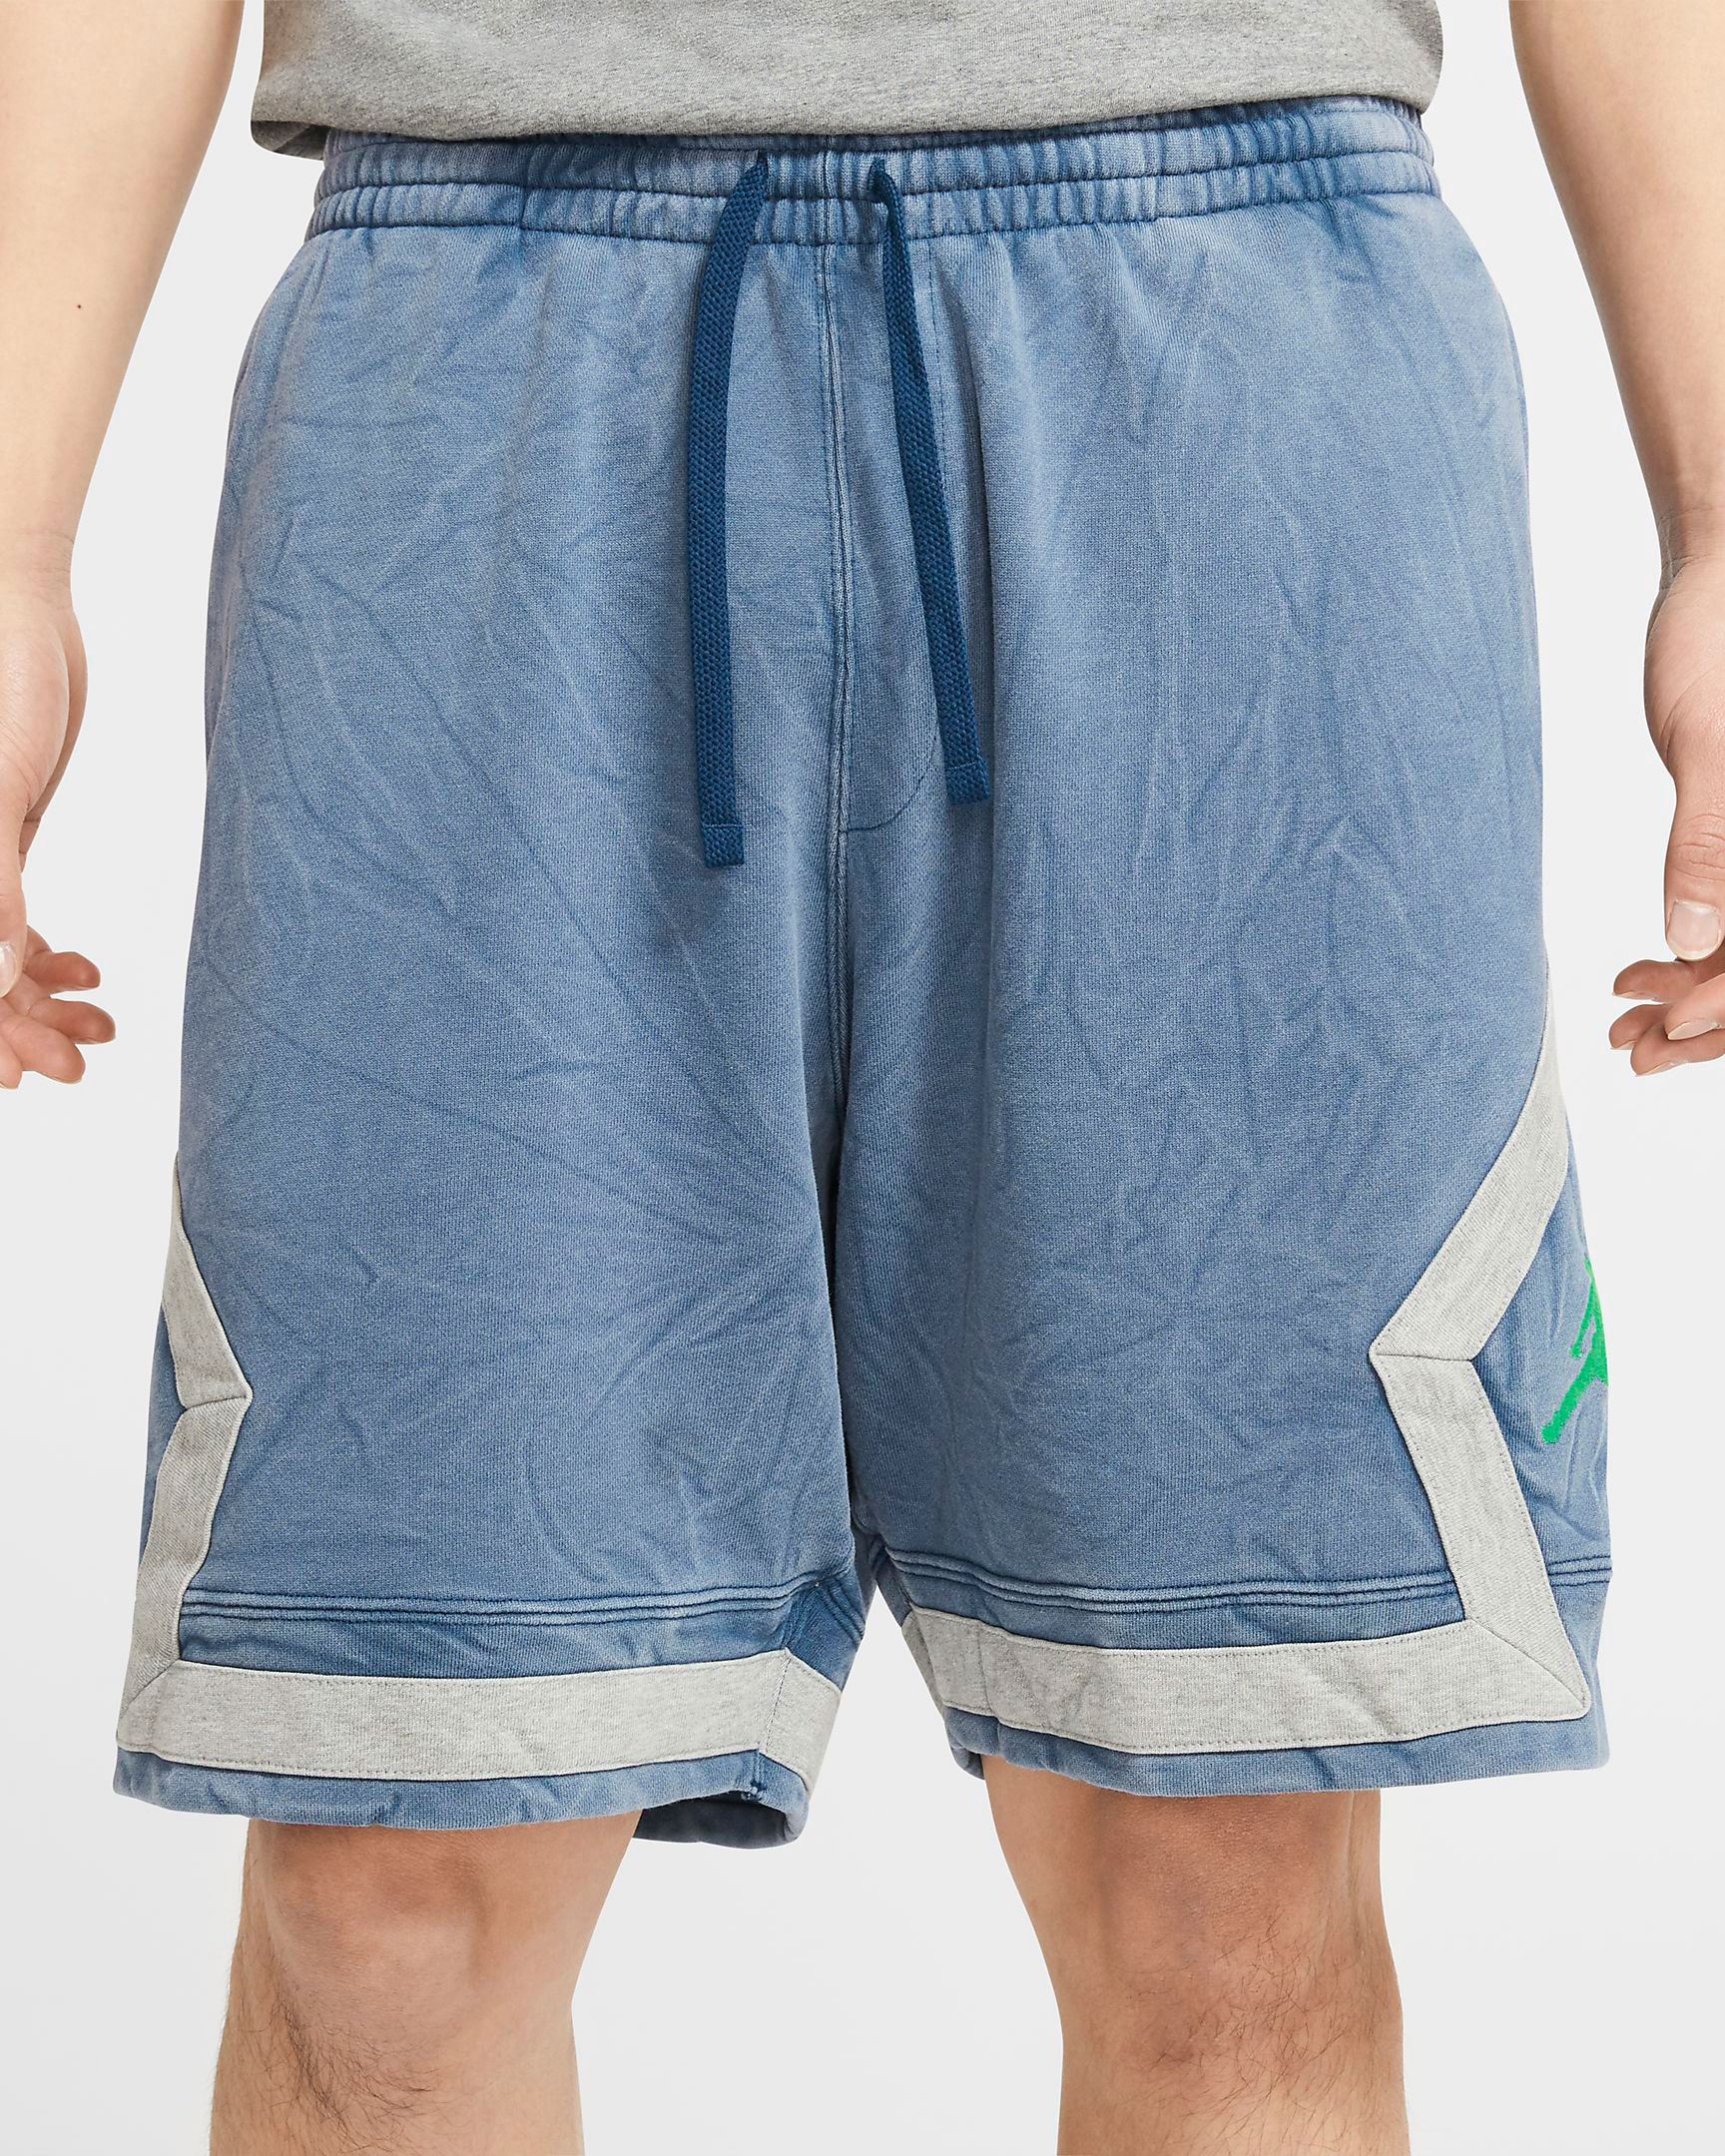 jordan-12-indigo-stone-blue-shorts-match-1